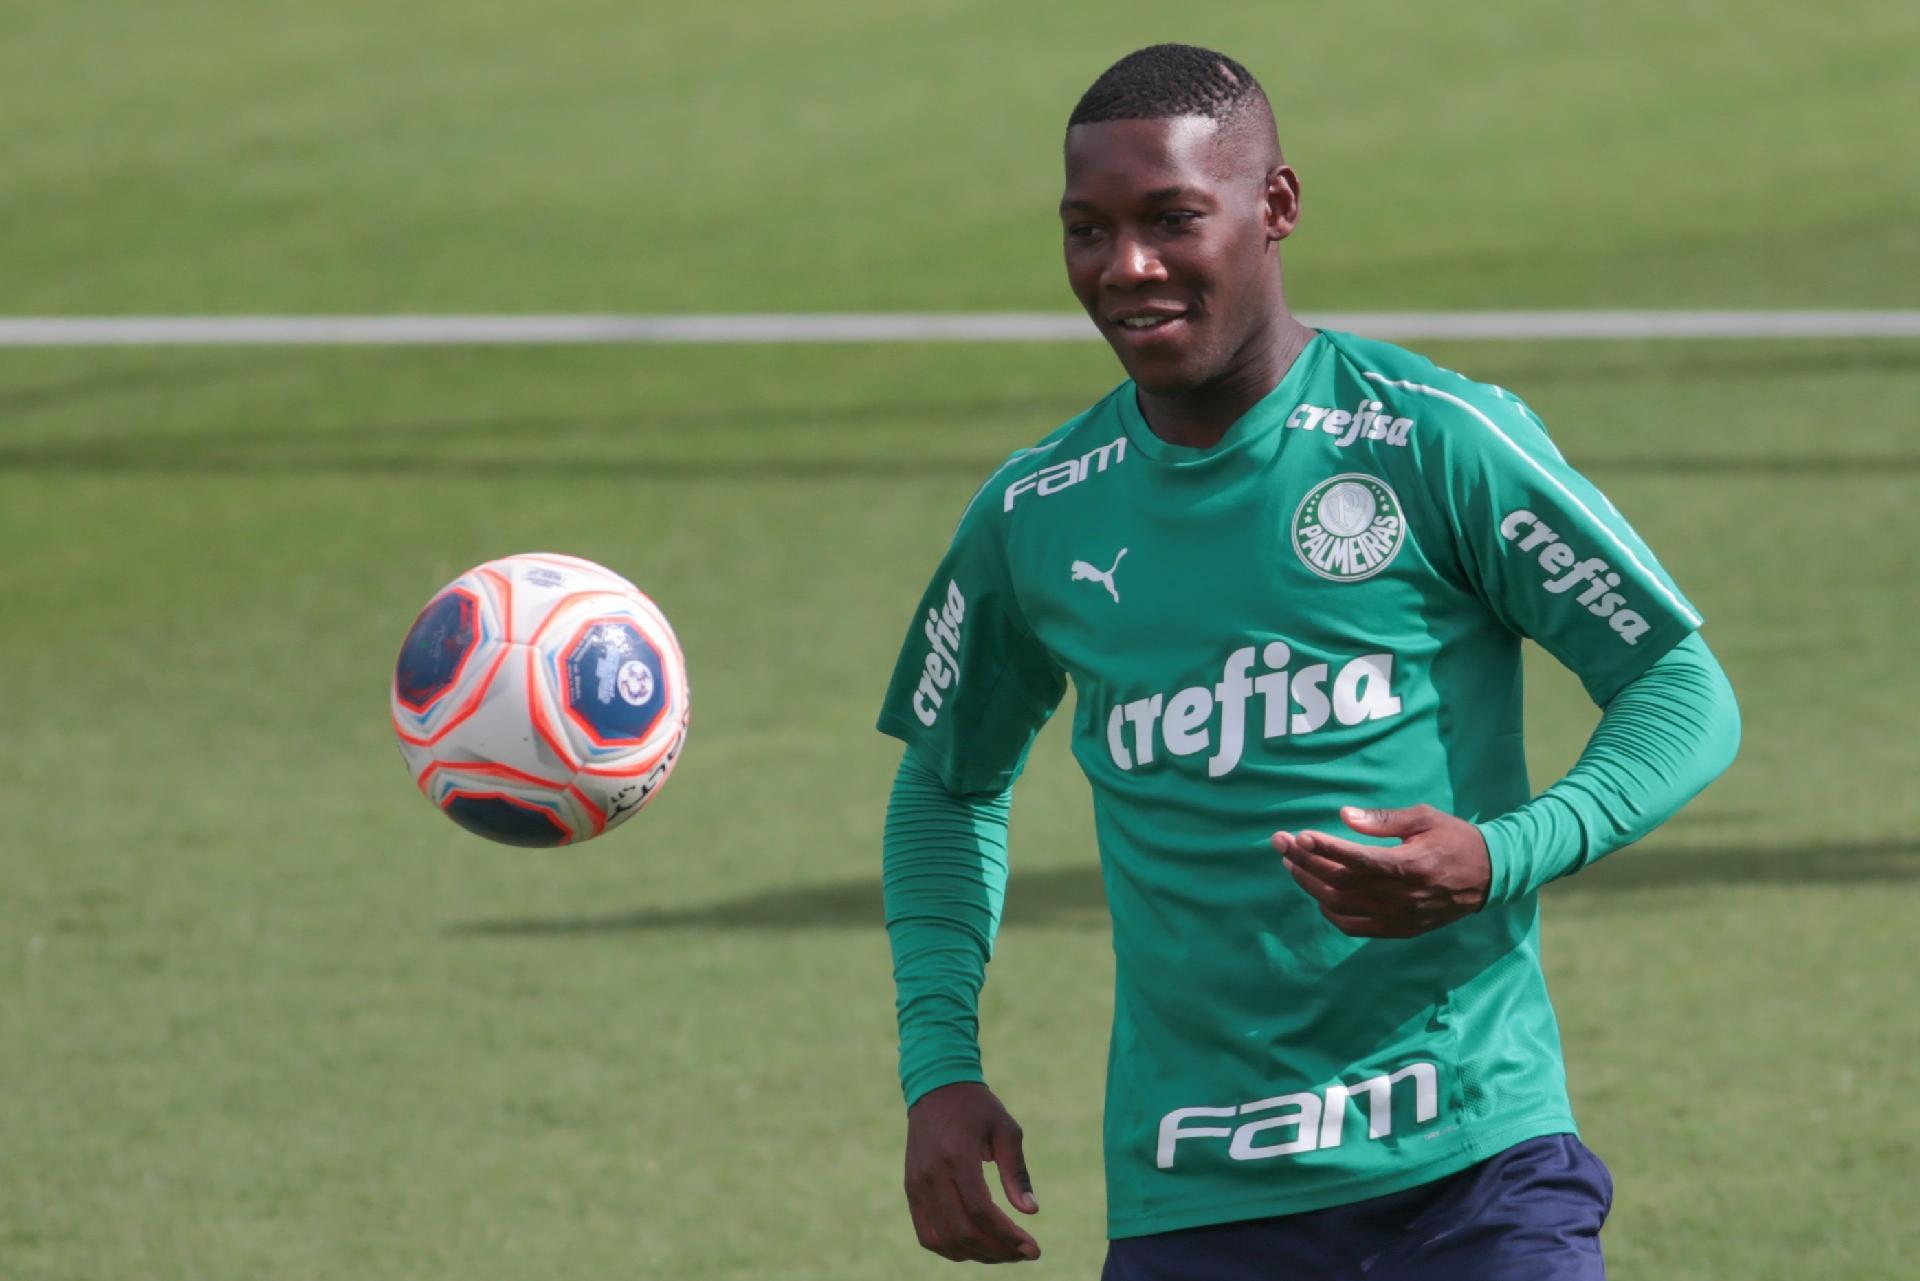 Patrick de Paula, o novo xodó do Palmeiras